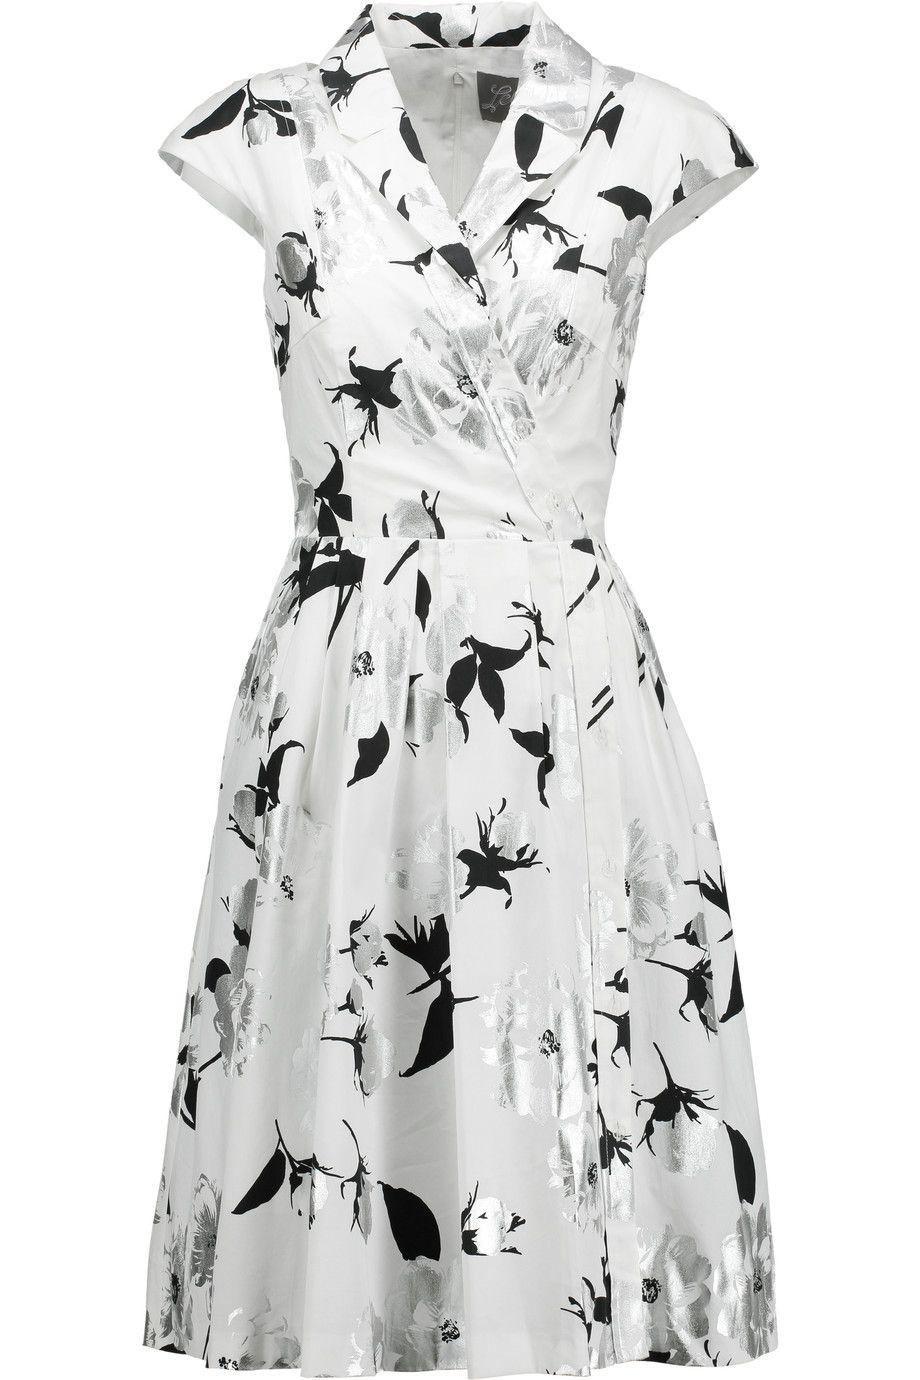 Lela Rose Woman Floral-print Stretch-cotton Dress White Size 4 Lela Rose Discount High Quality Buy Cheap Cheap Purchase Cheap Price Original Cheap Price Discount Authentic CSOlQ